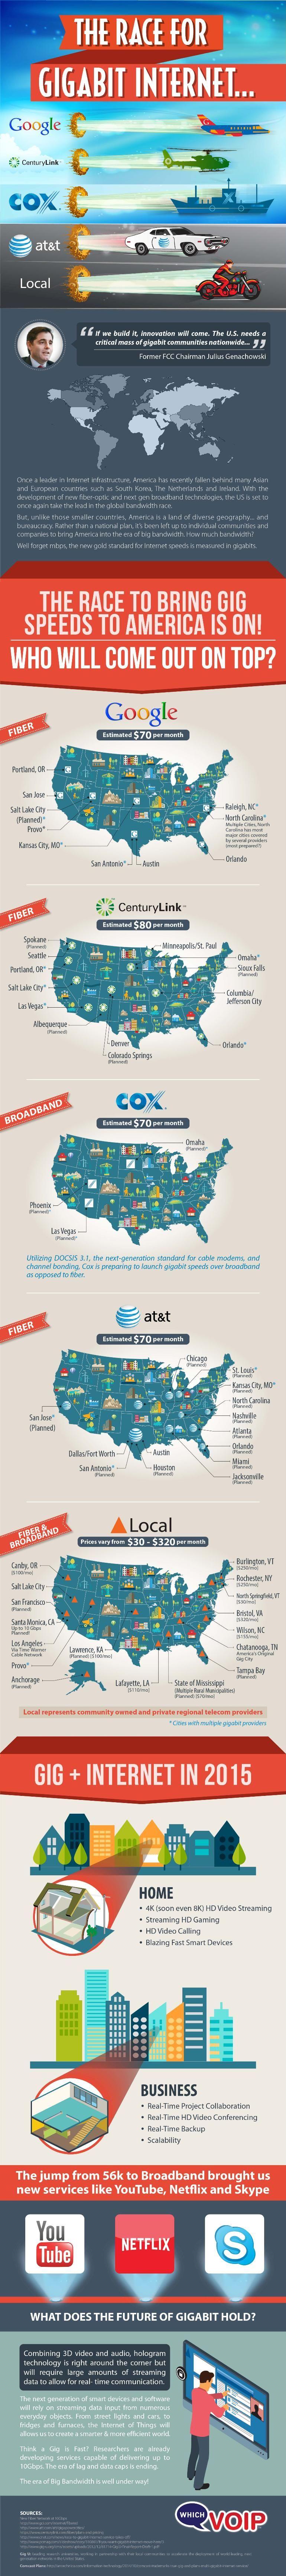 The Race for Gigabit internet #infographic